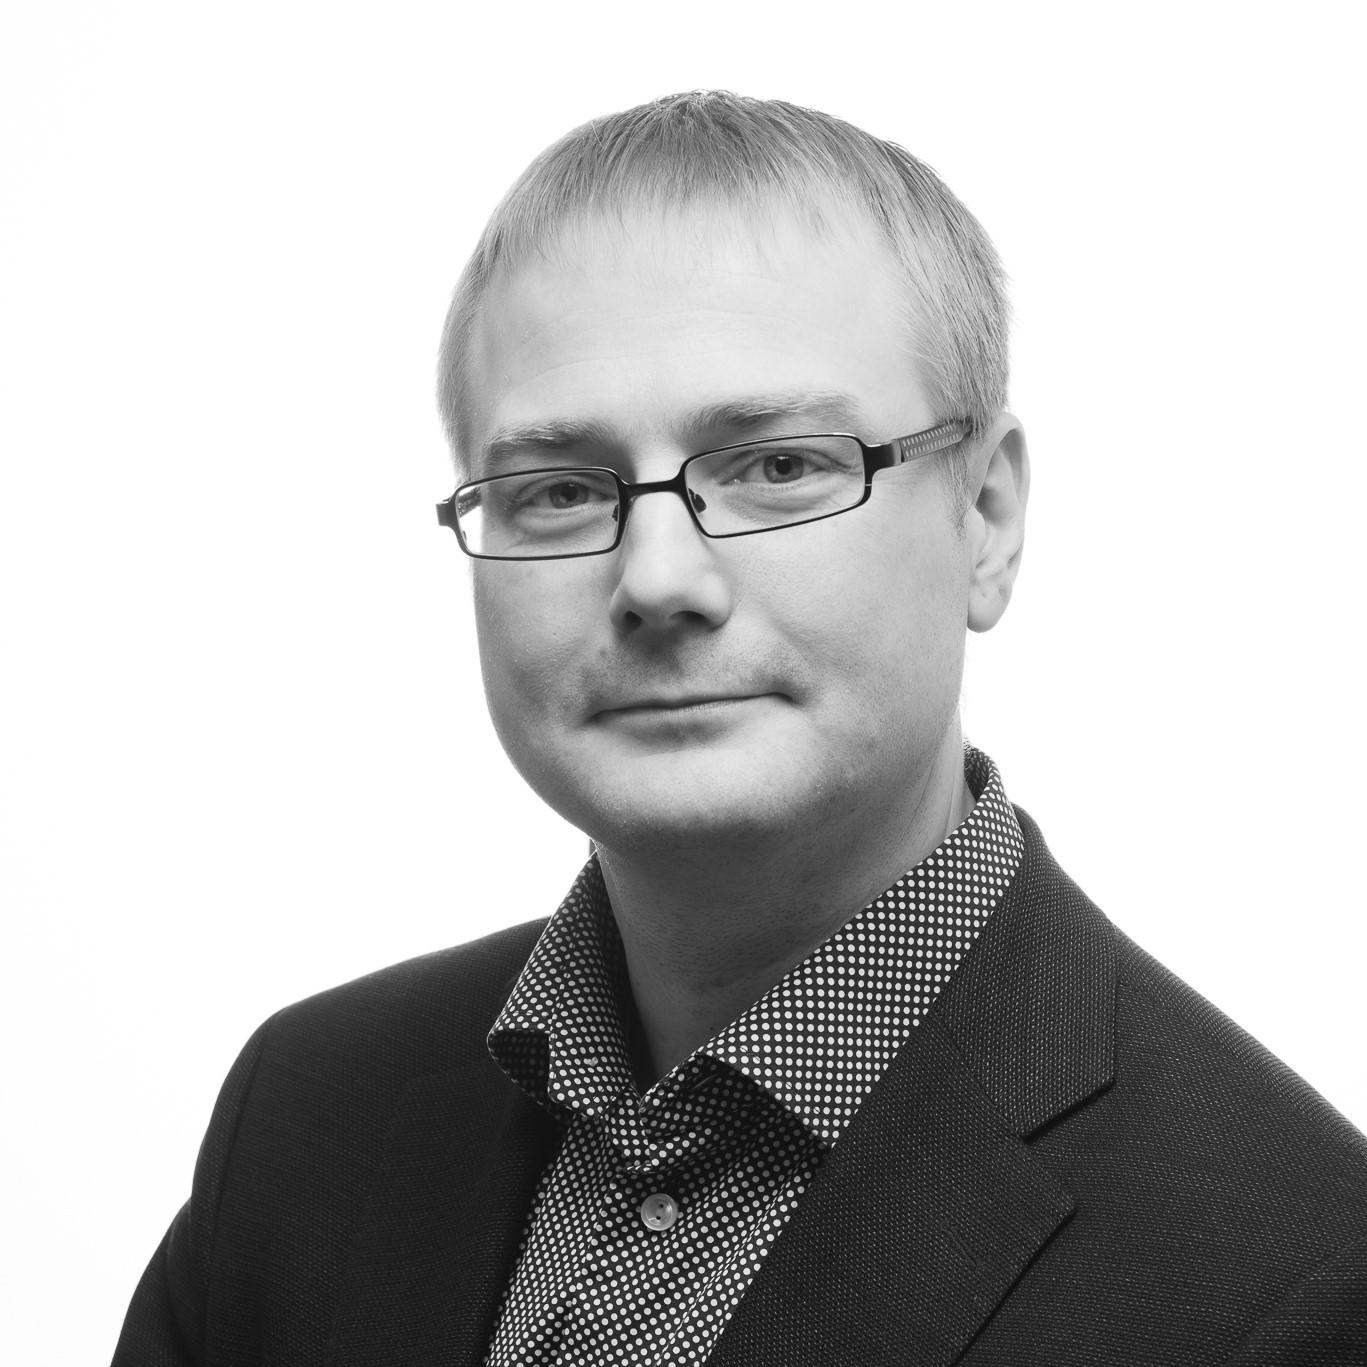 Kristian - Svartvit profil